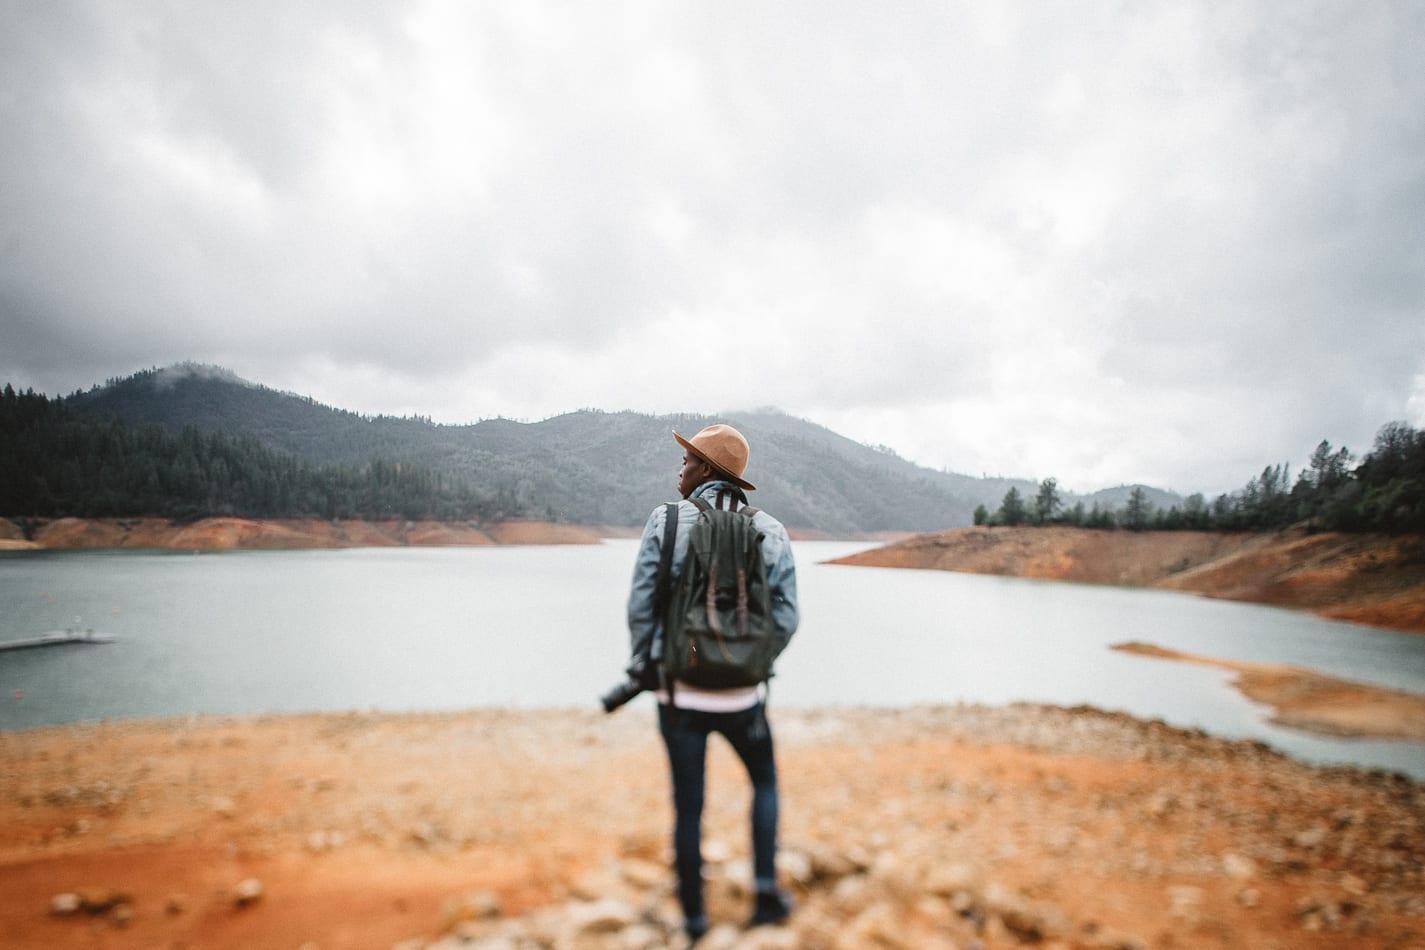 shasta-lake-redding-california-lifestyle-portrait-photographer-2